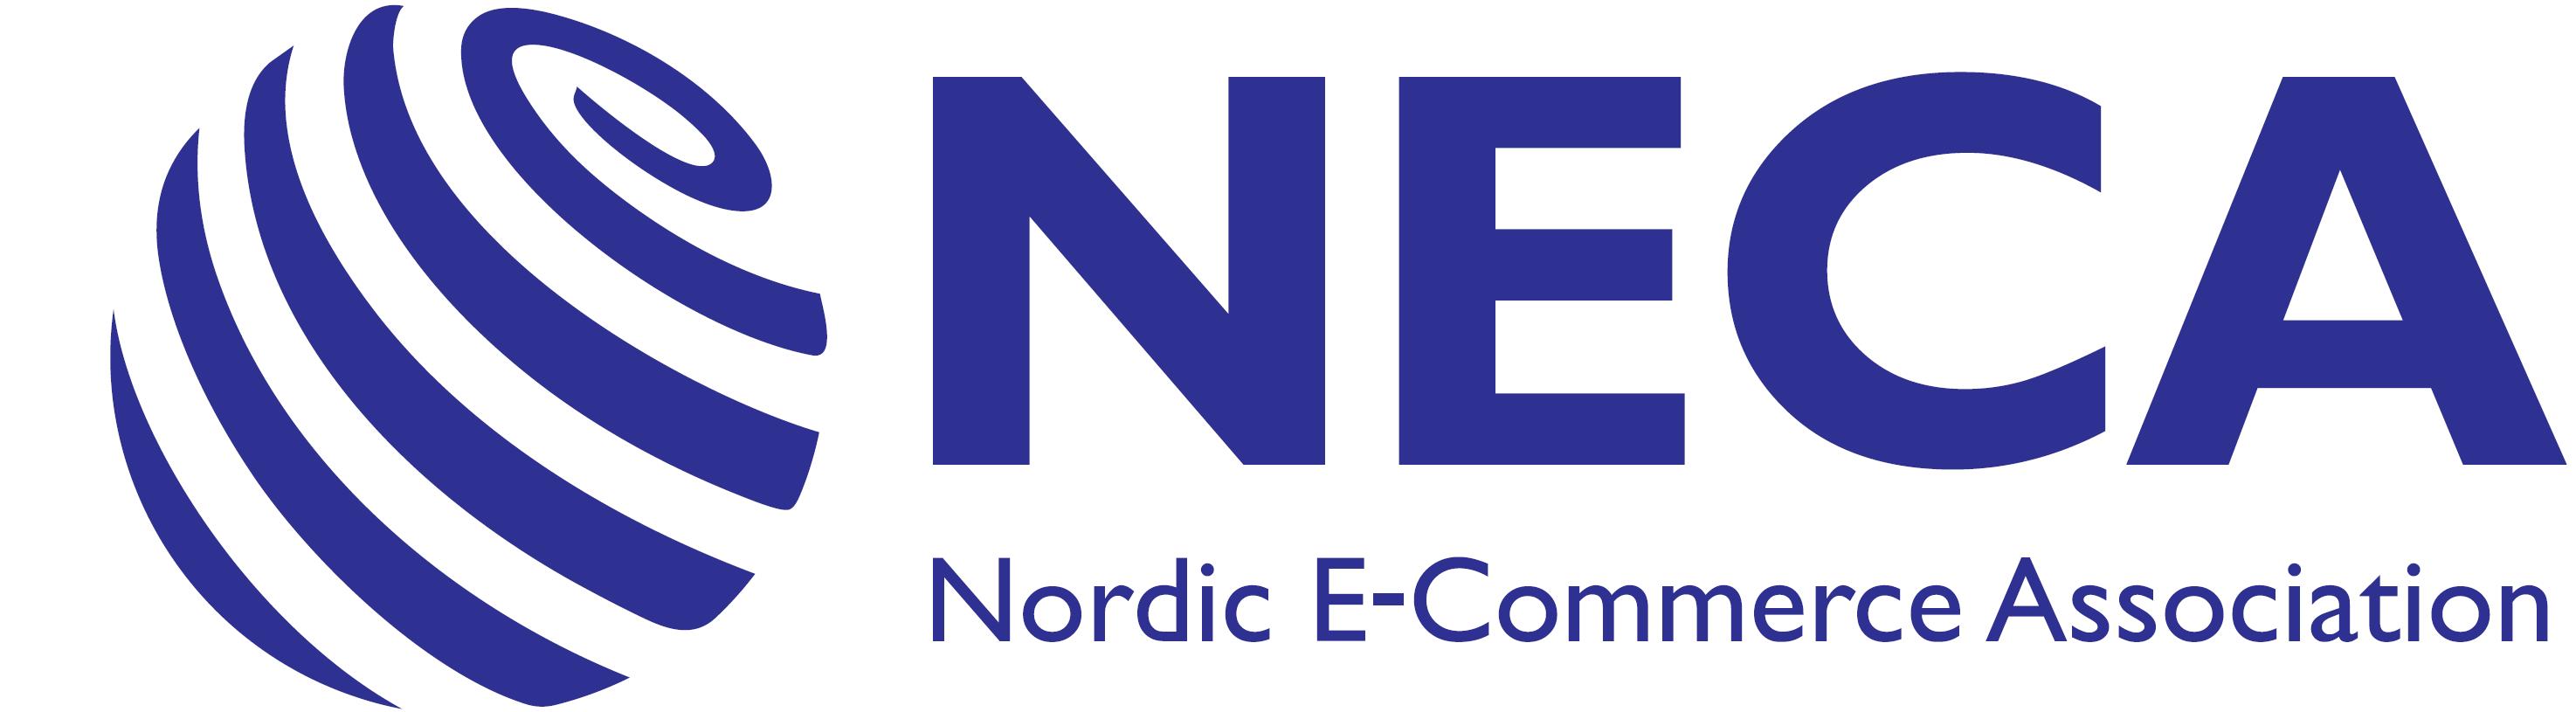 Nordic E-Commerce Association